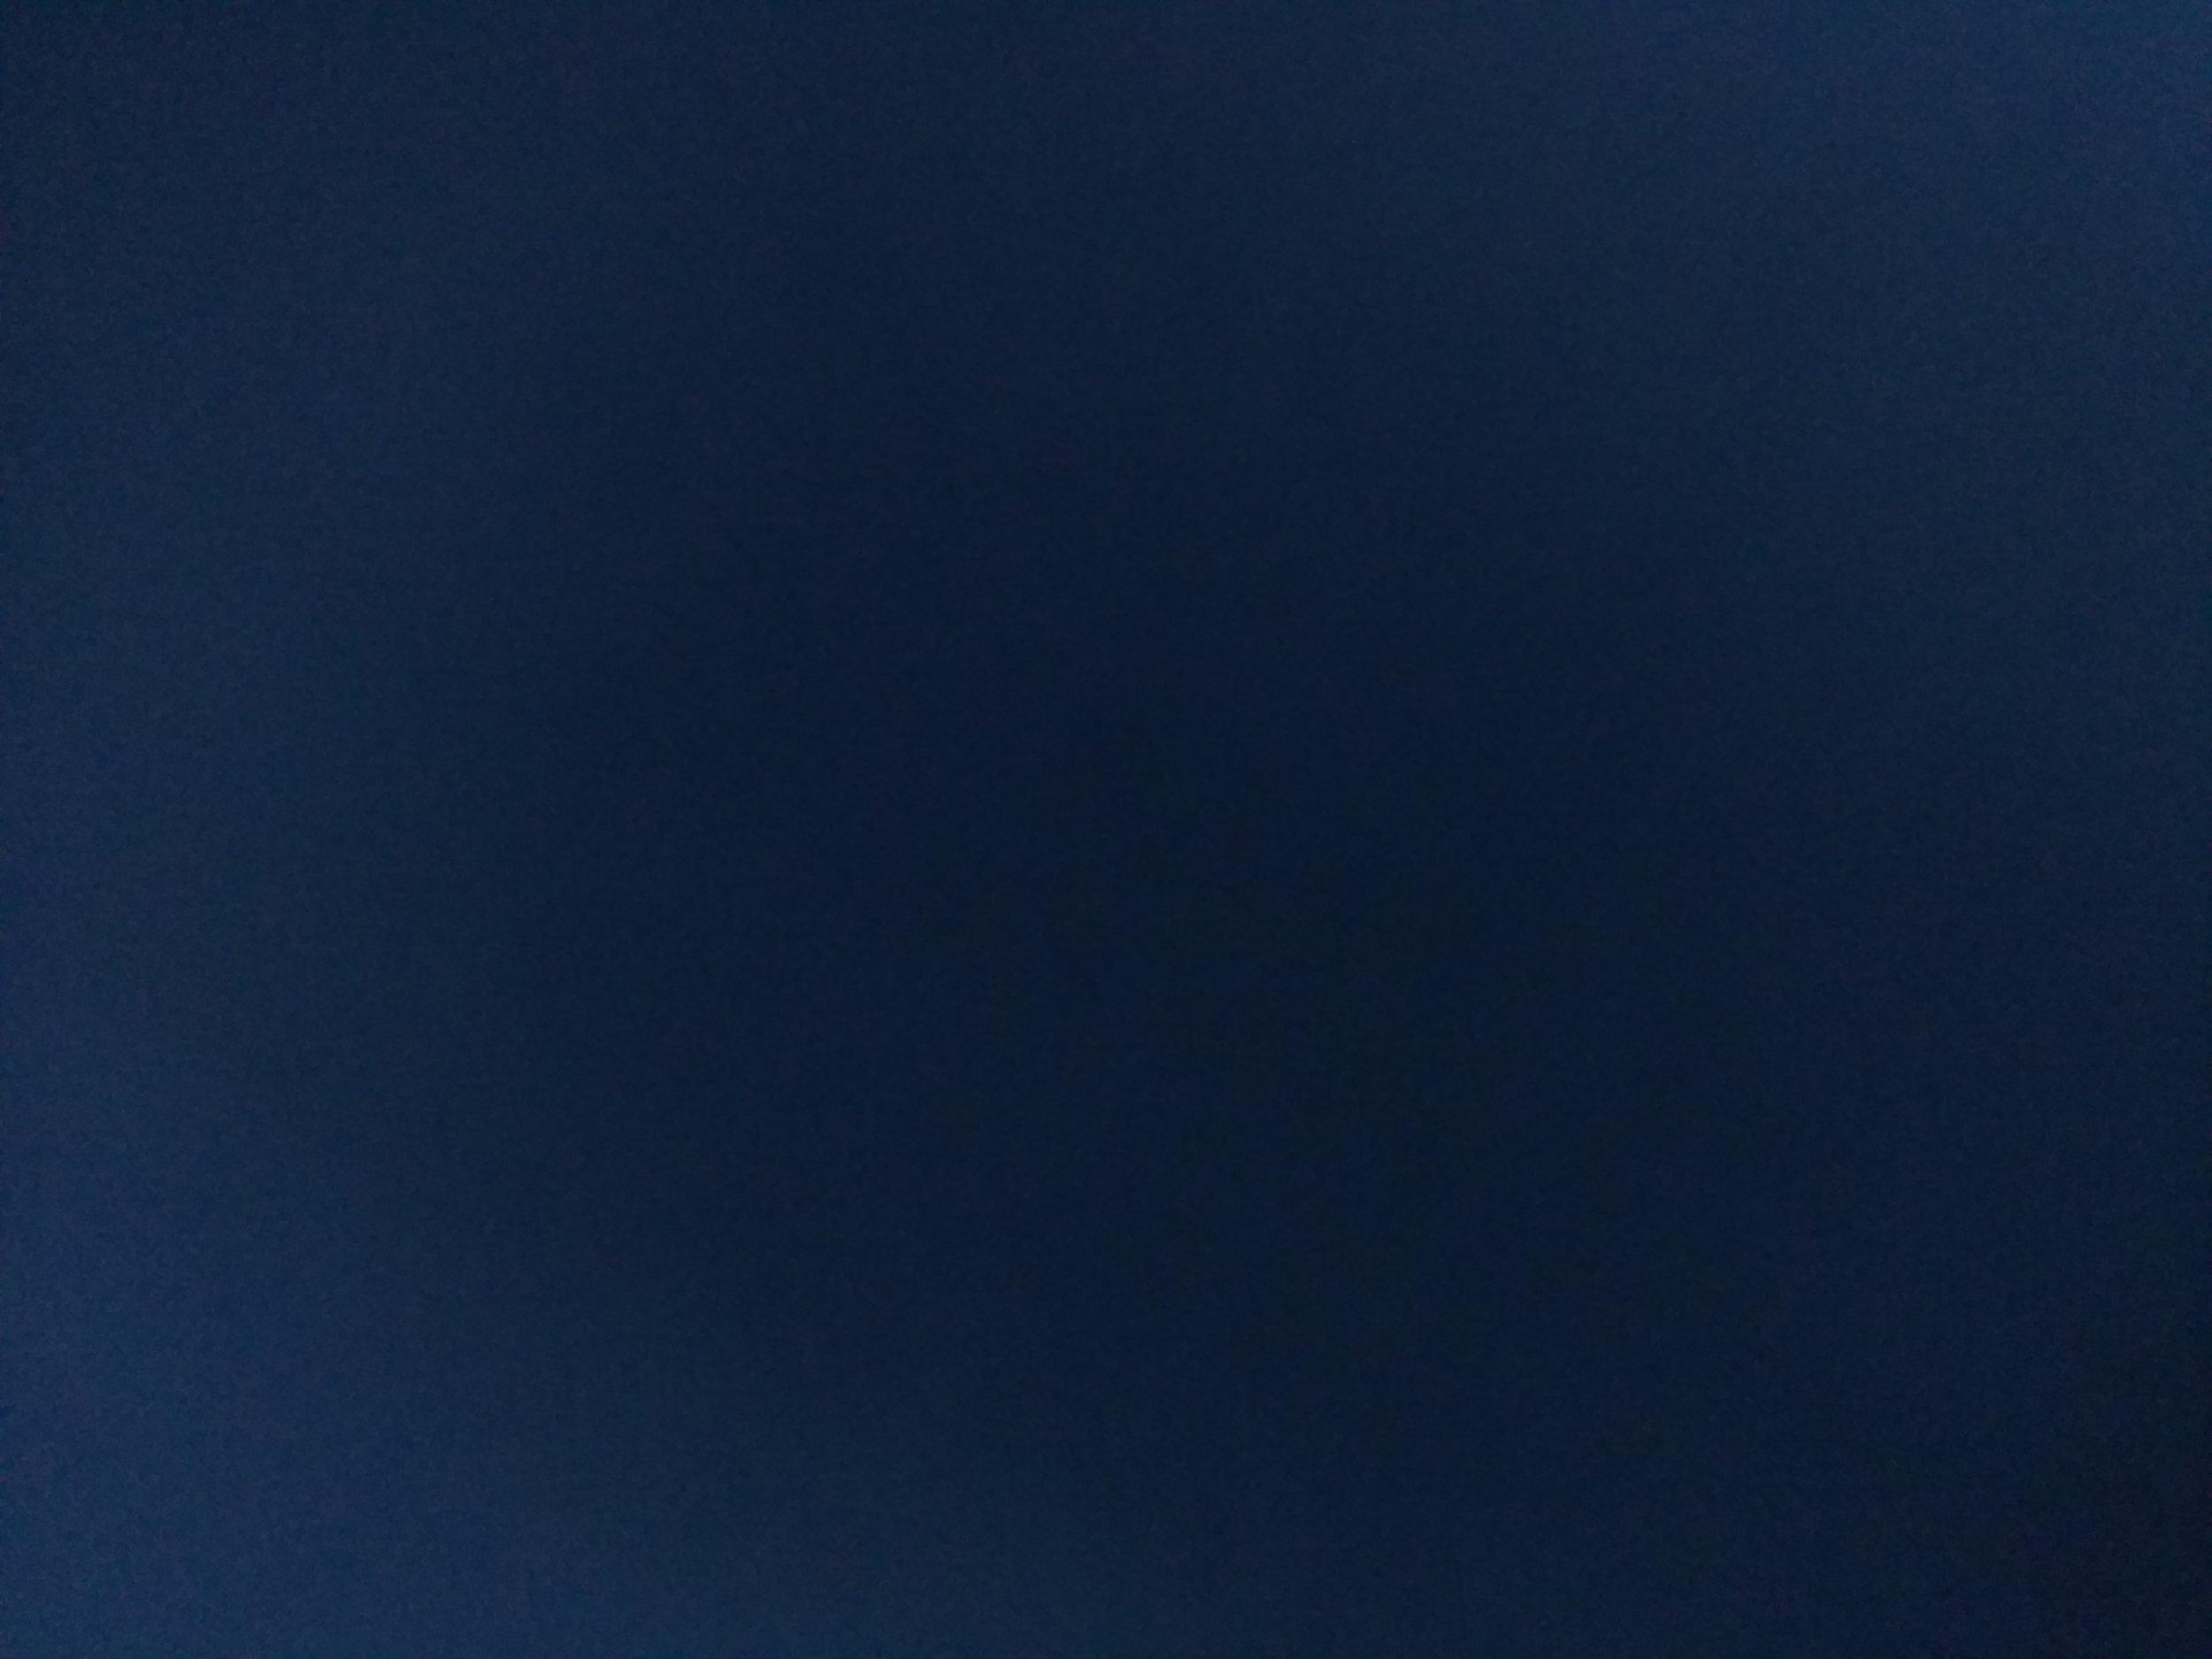 willroth-co-free-texture-gradient-082.jpg